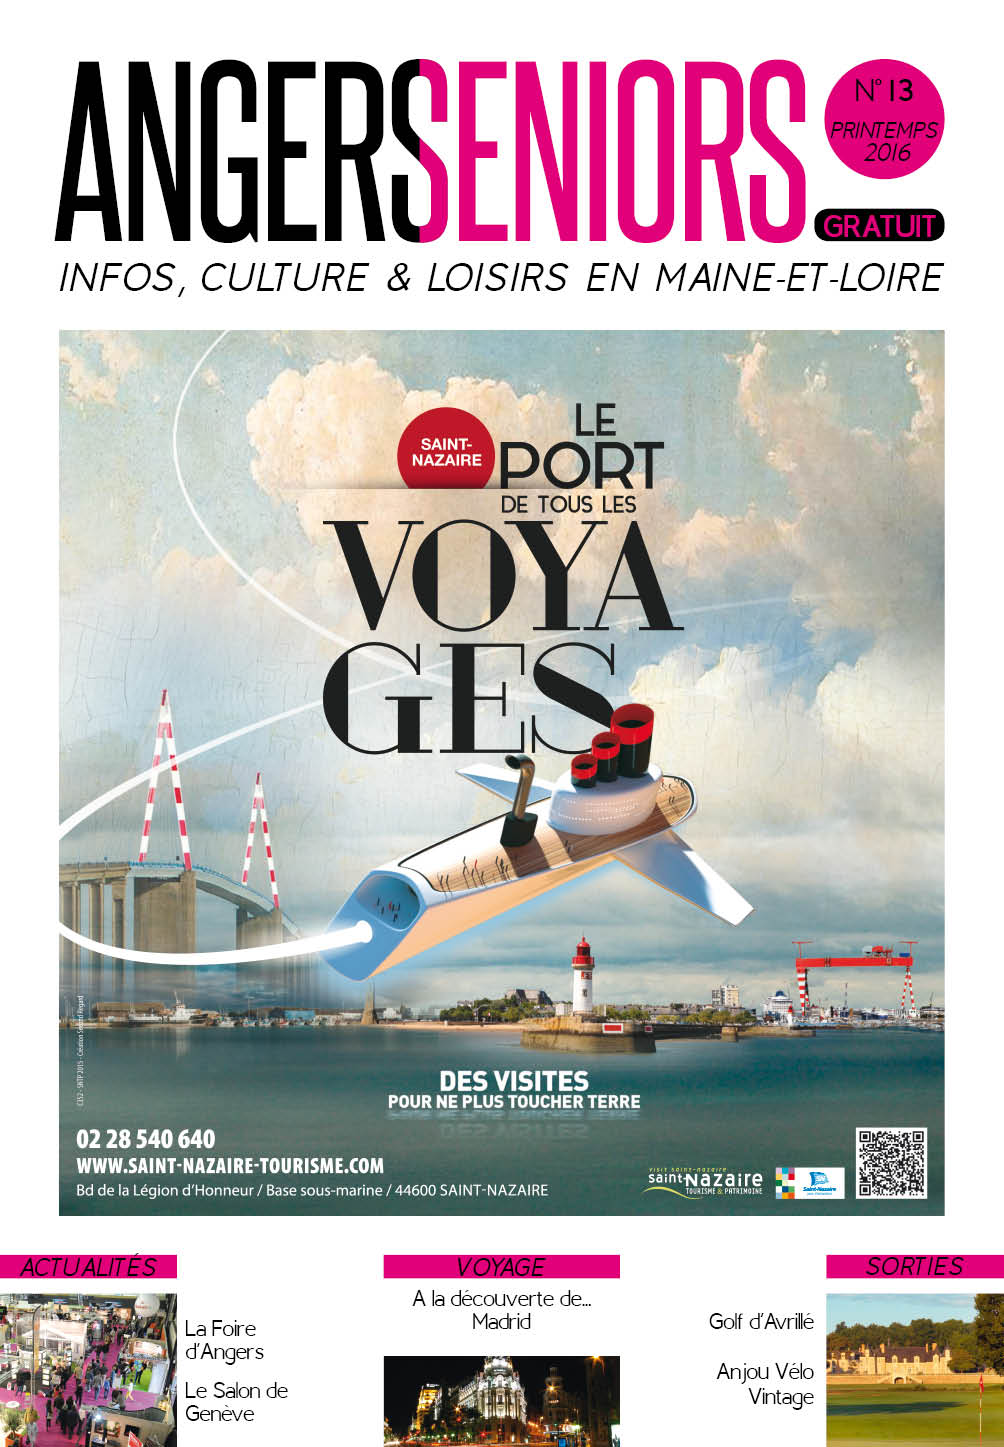 Angers Seniors - Printemps 2016